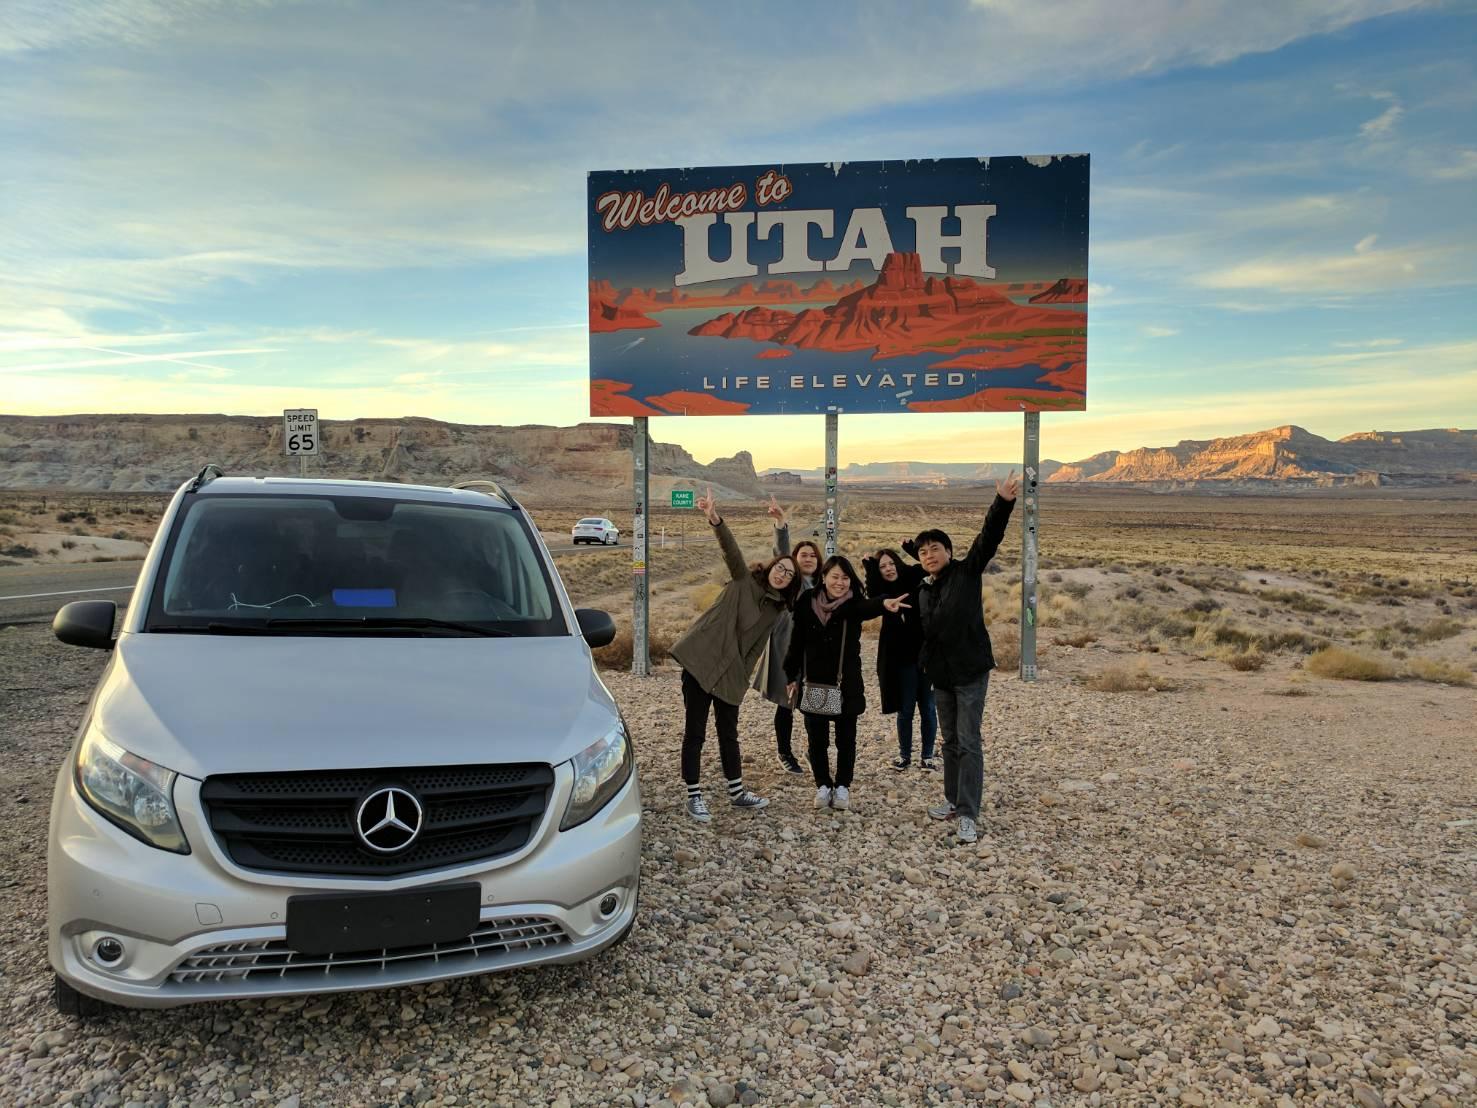 VIP Antelope Canyon Horseshoe Bend Tour